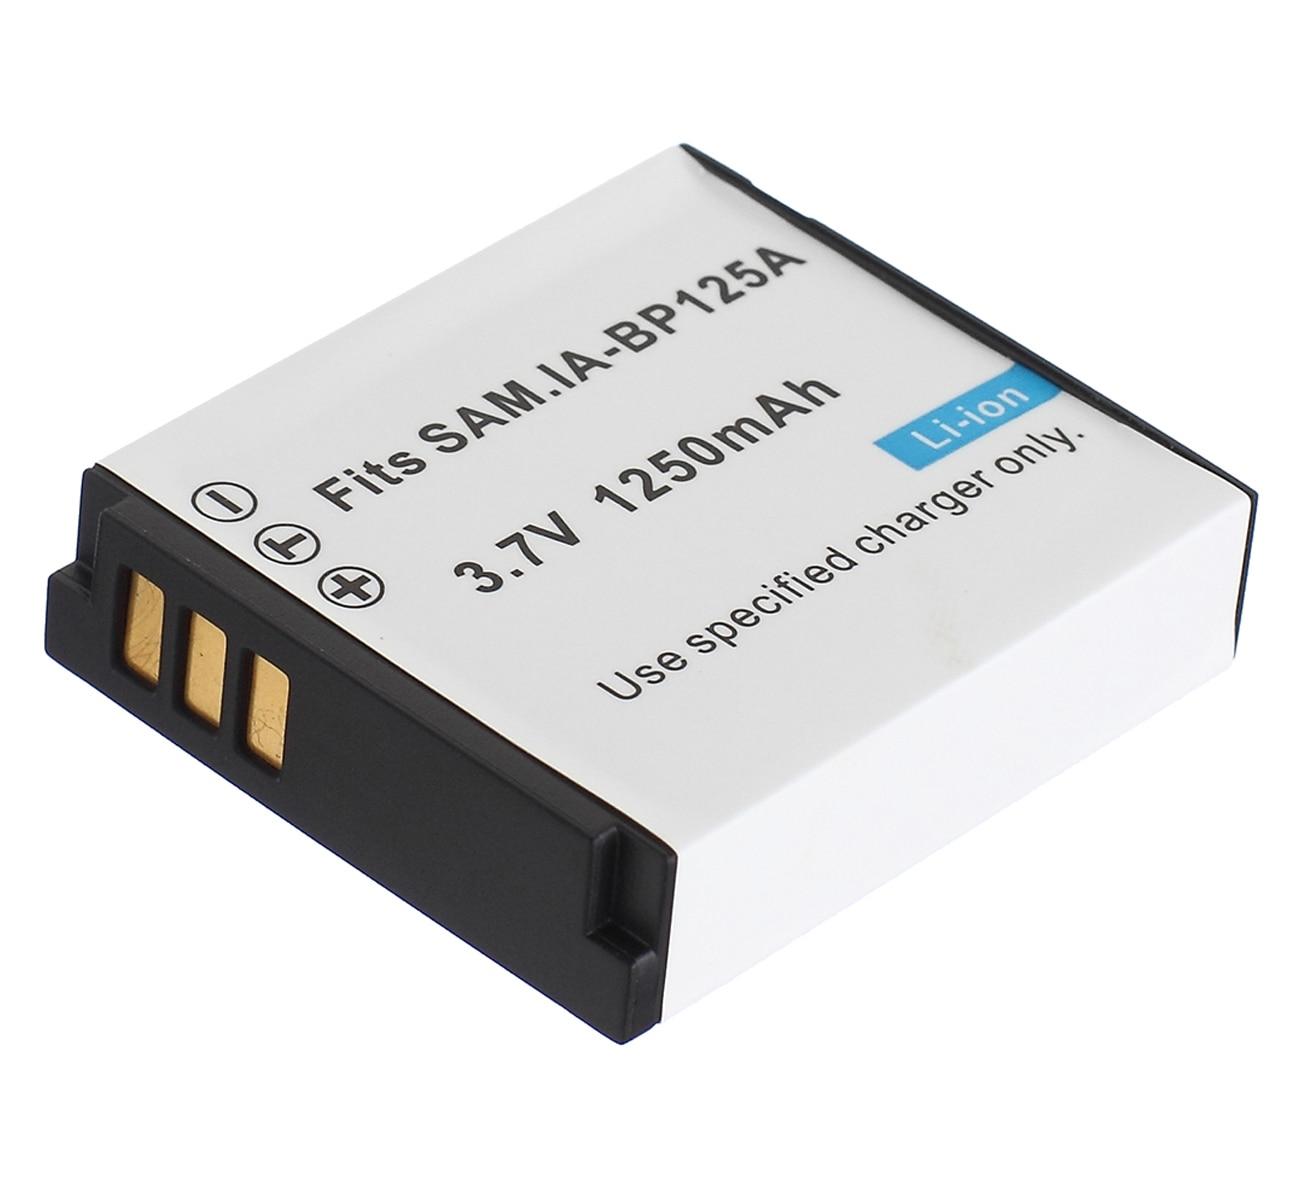 Battery Pack For Samsung HMX-Q10BP, HMX-Q11BP, HMX-Q20BP, HMX-Q100BP, HMX-Q130BP, HMX-Q200BP, HMX-QF20BP, HMX-QF30BP Camcorder